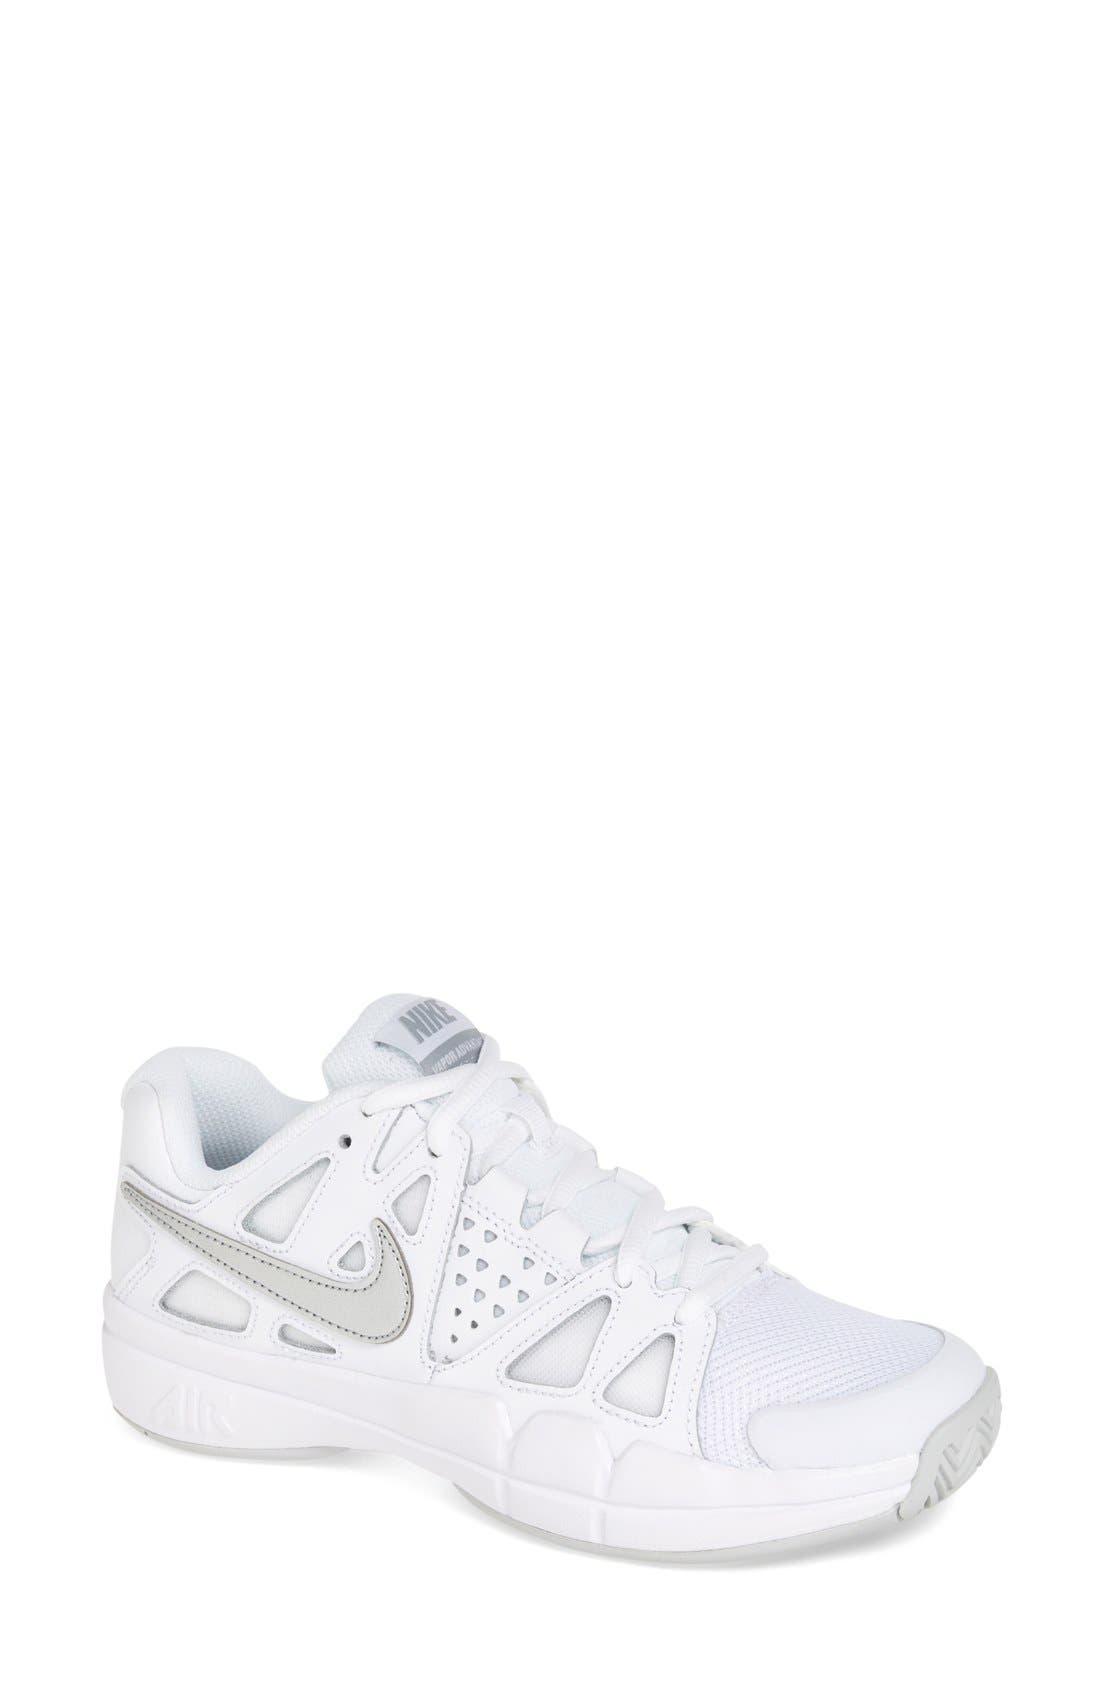 Main Image - Nike 'Air Vapor Advantage' Tennis Shoe (Women)